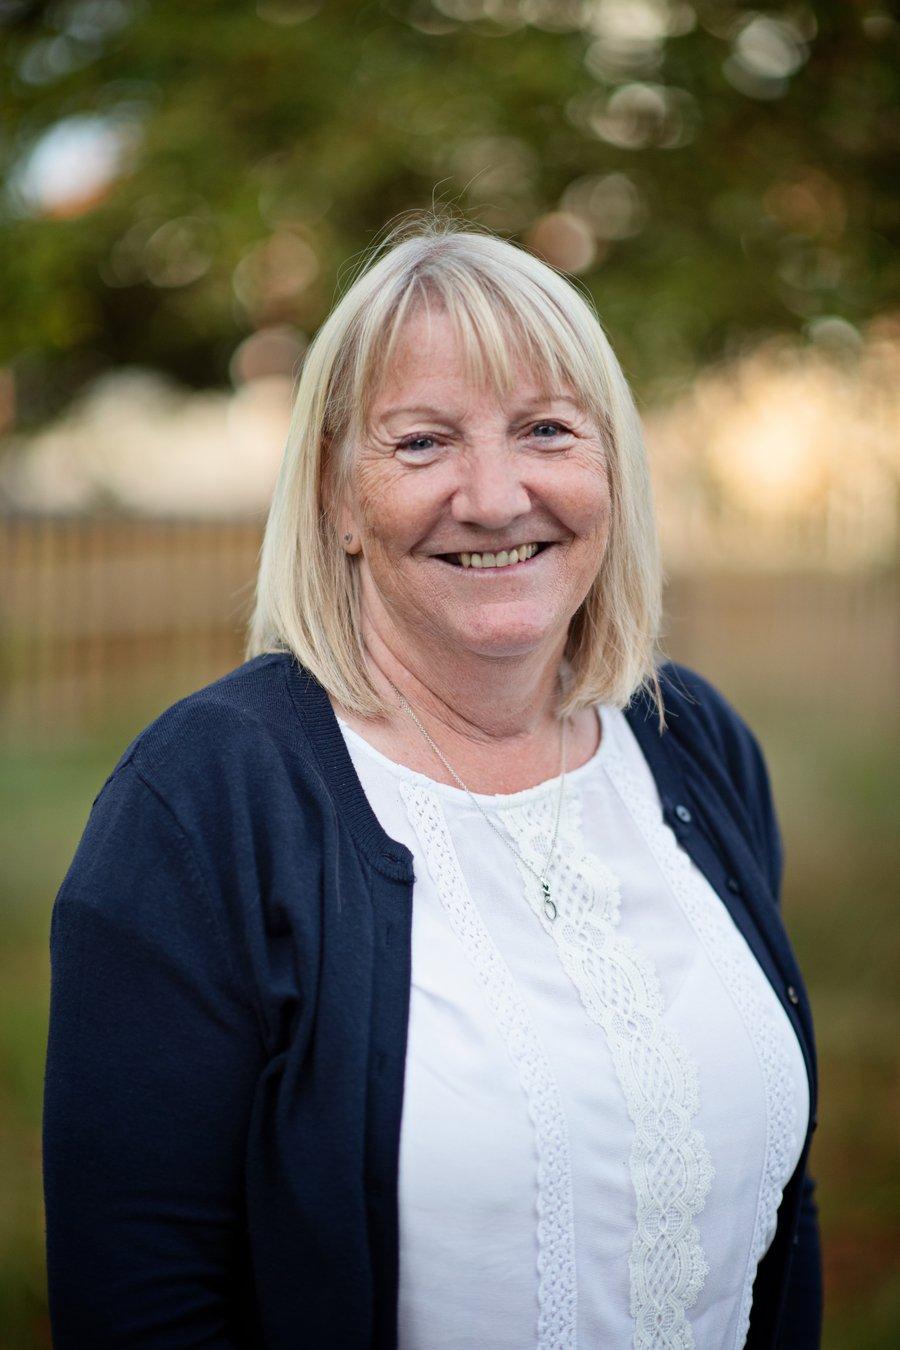 Mrs MacDonald, Year 4 TA